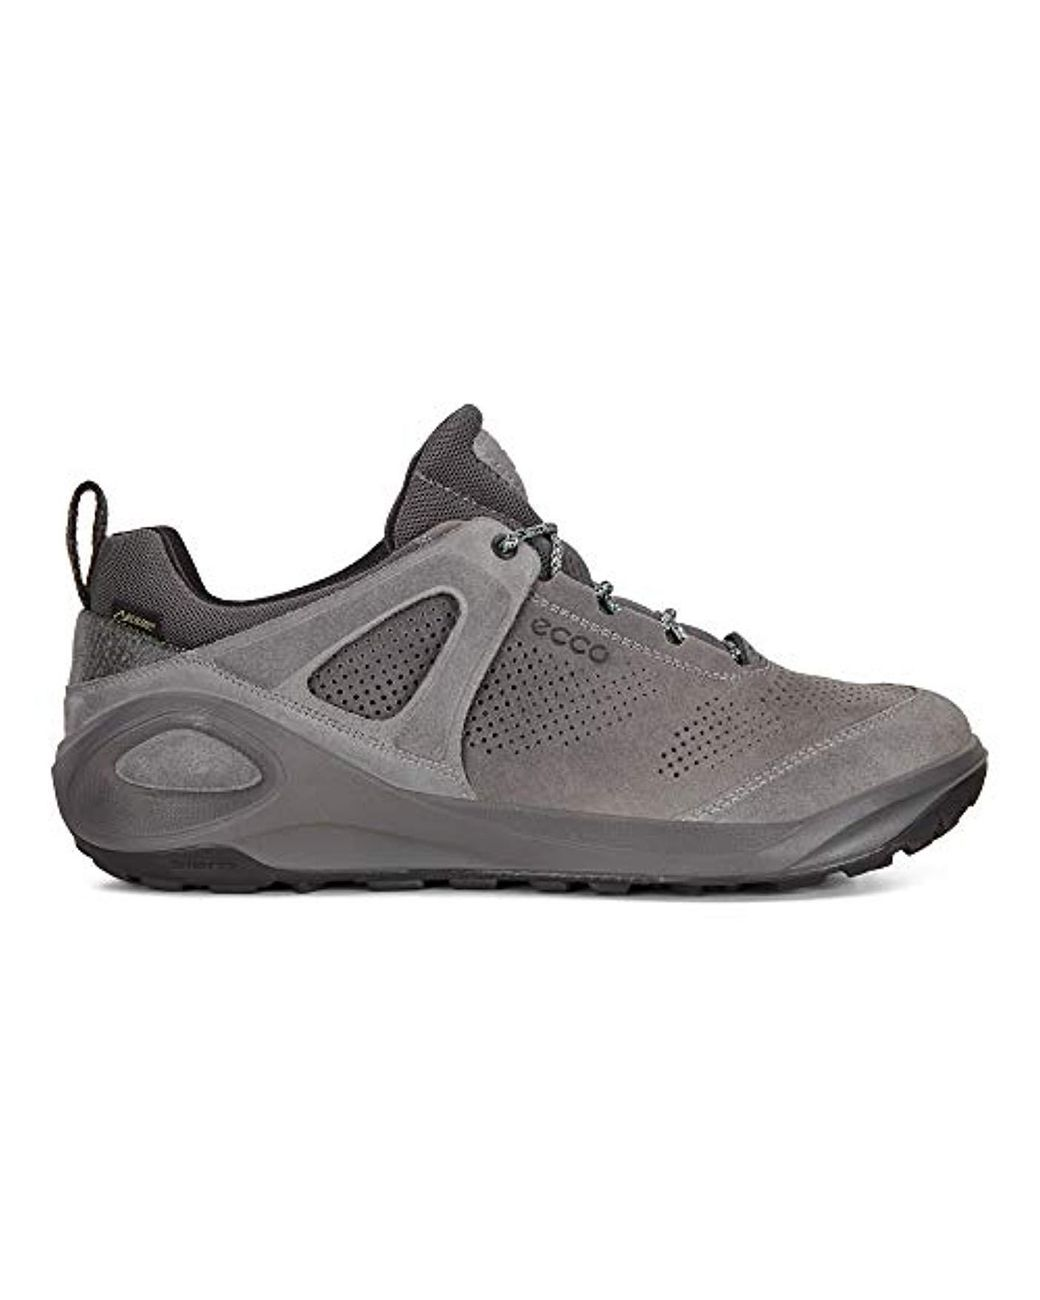 Outdoor Lifestyle Multi-Sport Sneaker Hiking Shoe ECCO Mens Biom 2go Gore-tex-Waterproof